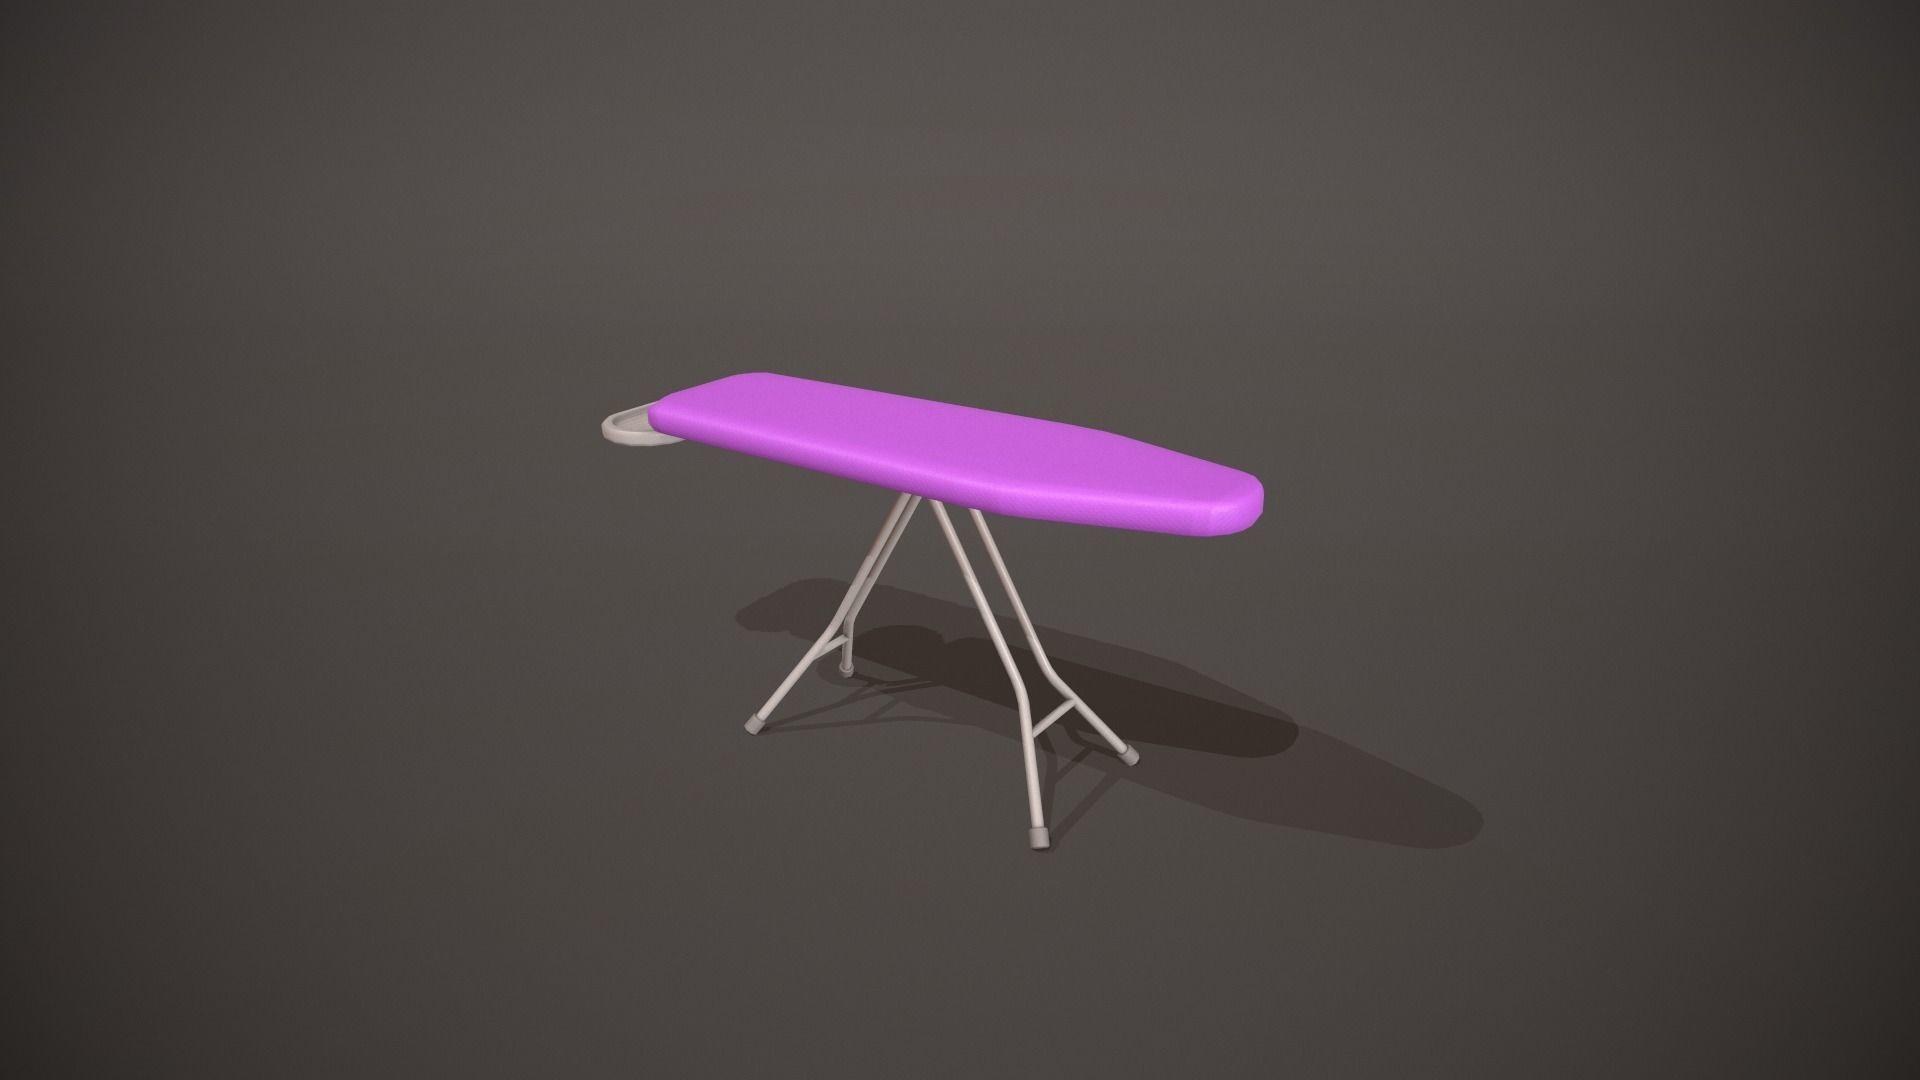 Purple Ironing Board